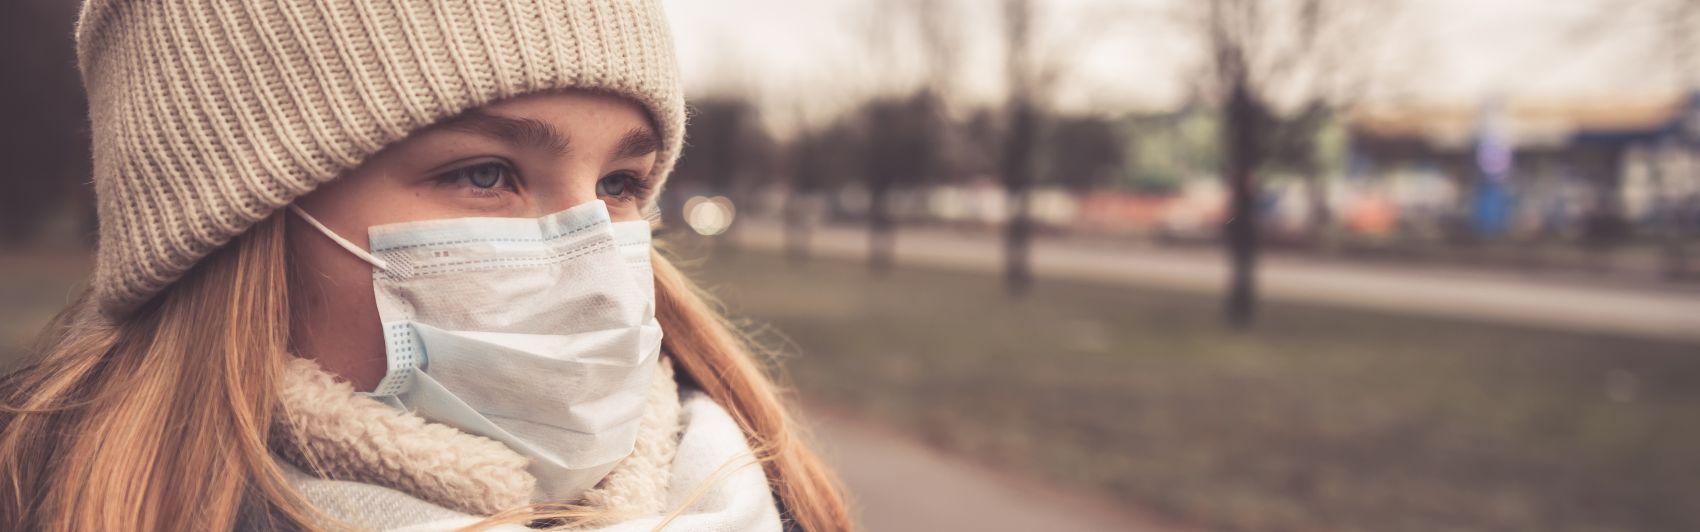 Virus Corona Infektion Schutz Krankheit Pandemie